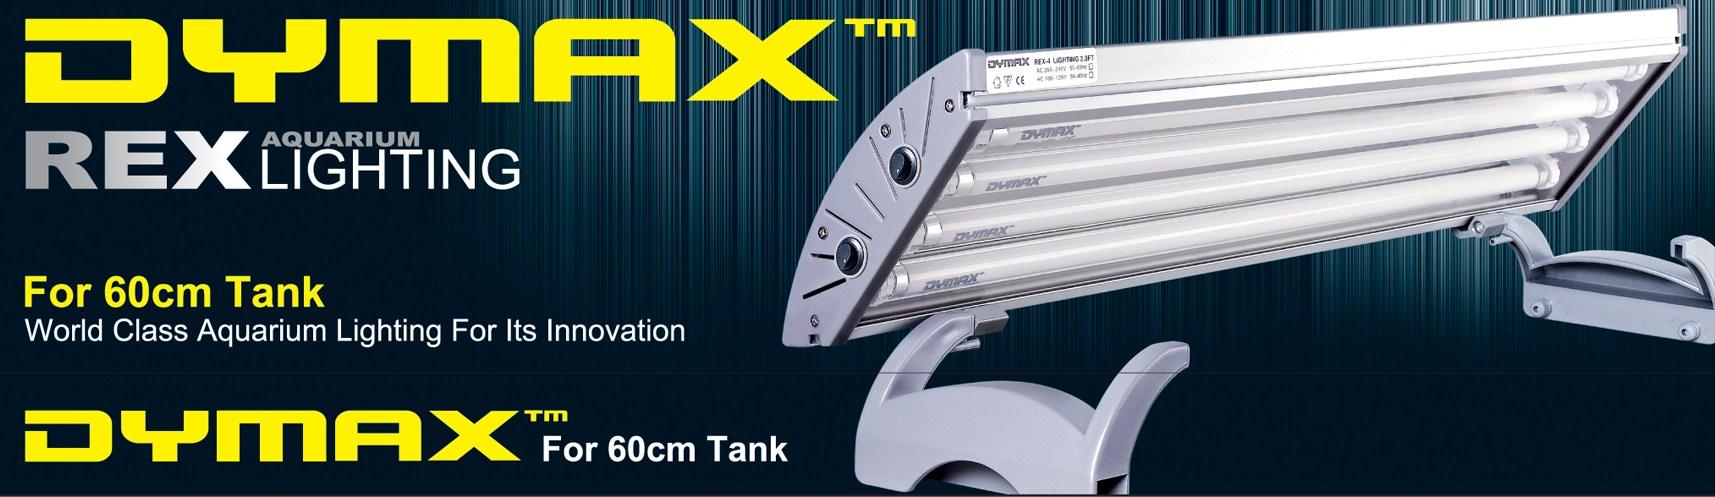 Dymax Luminária T5 Rex-4 (4X 14W) 60cm 110V